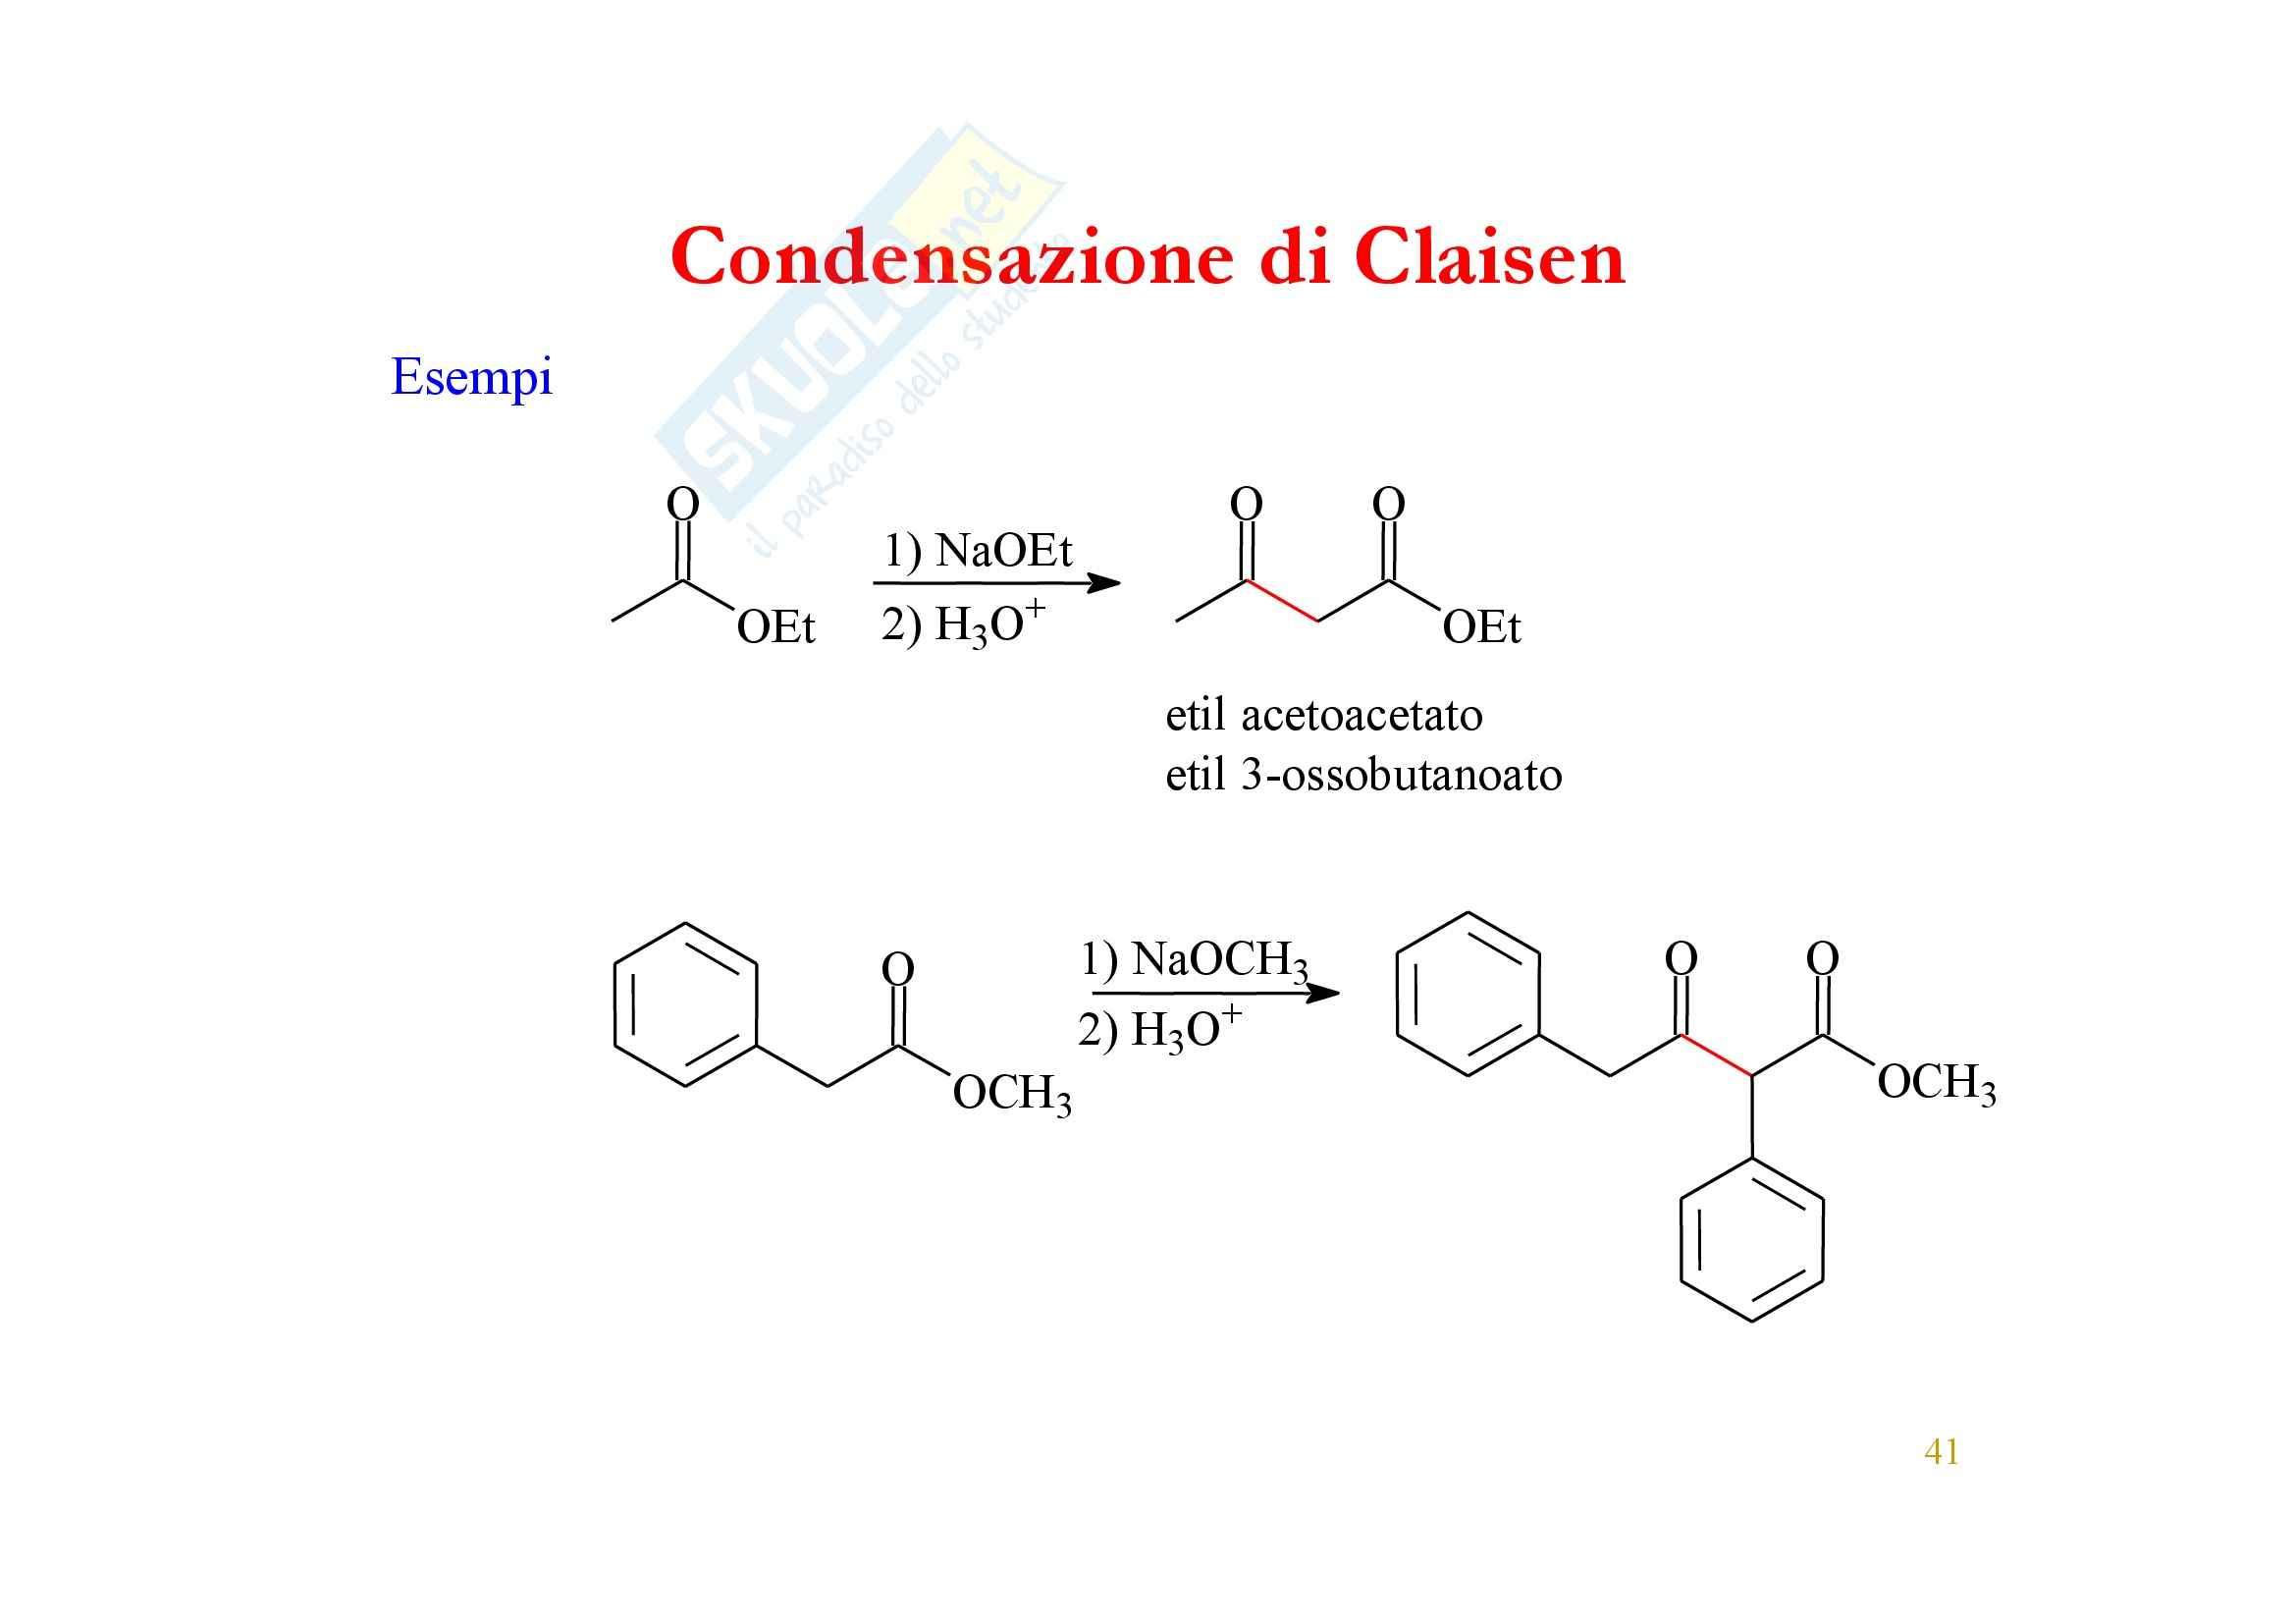 Chimica organica - enoli ed enolati Pag. 41